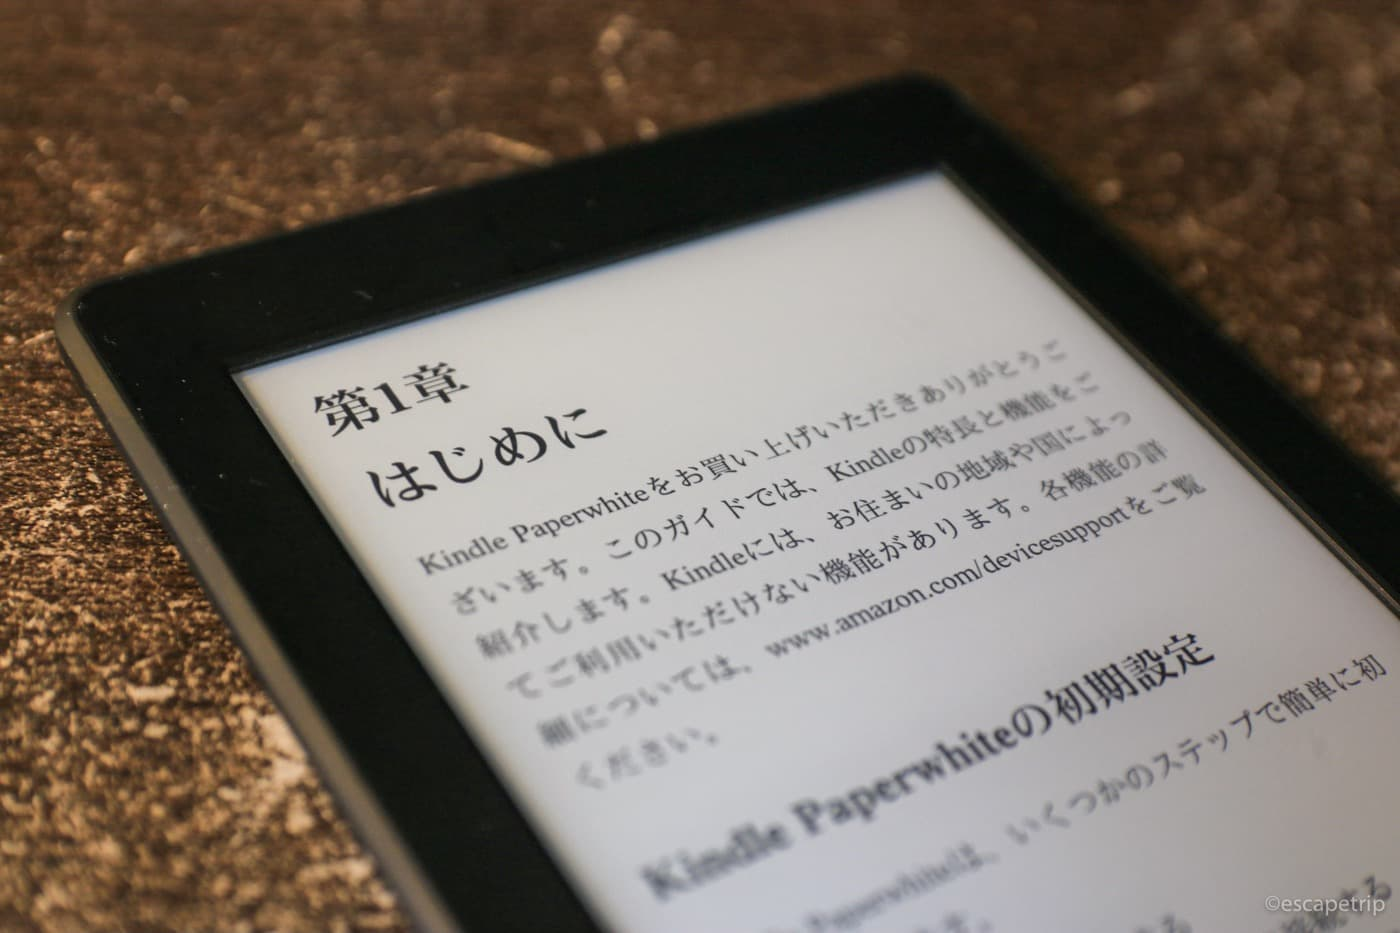 Kindleペーパーホワイトの画面